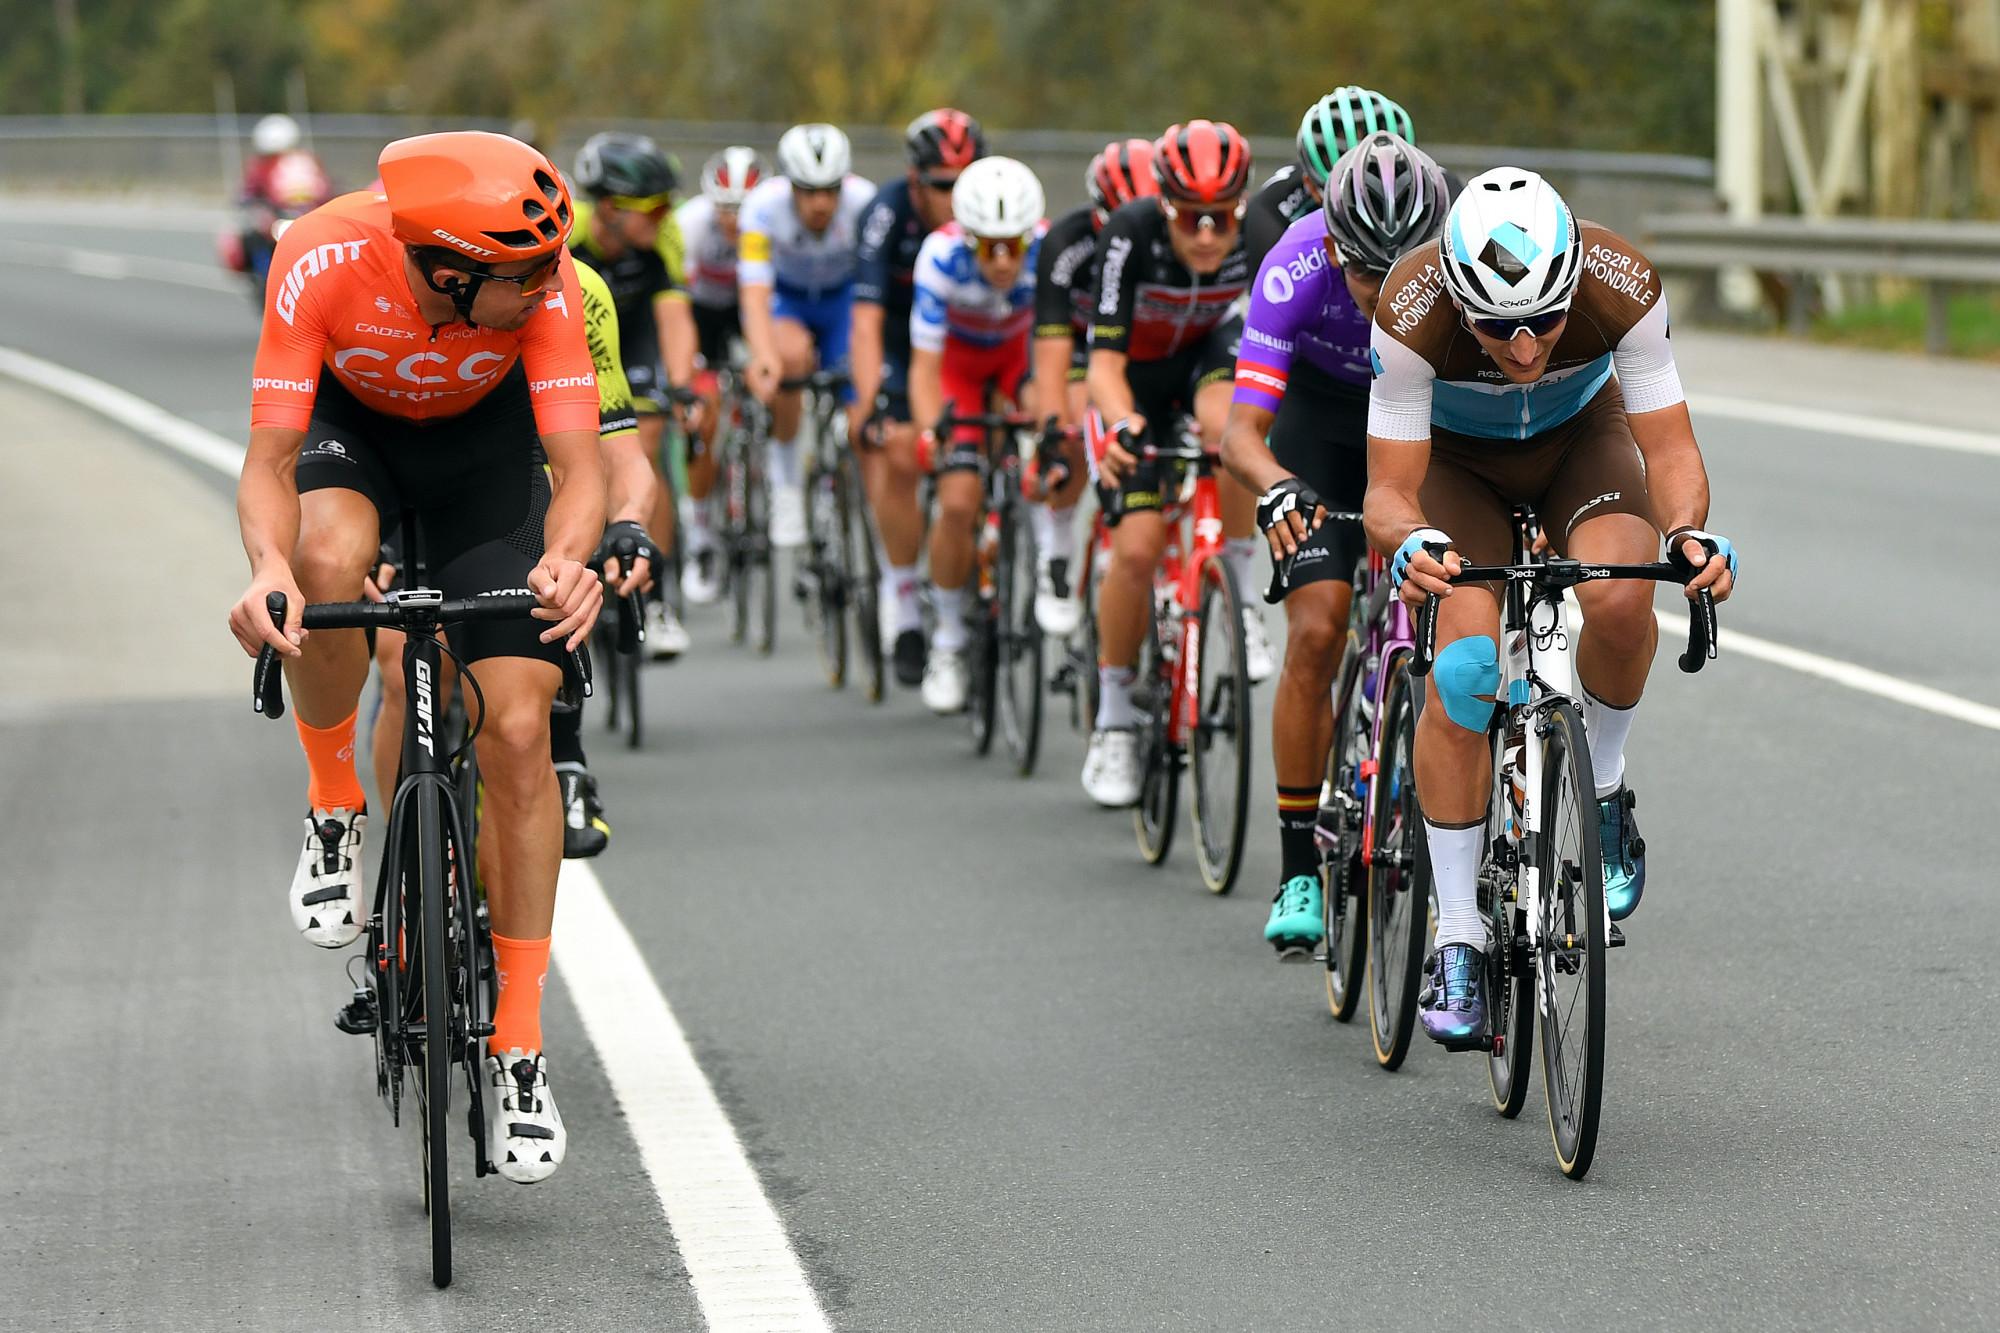 Nans Peters | La Vuelta ciclista a España - Stage 12